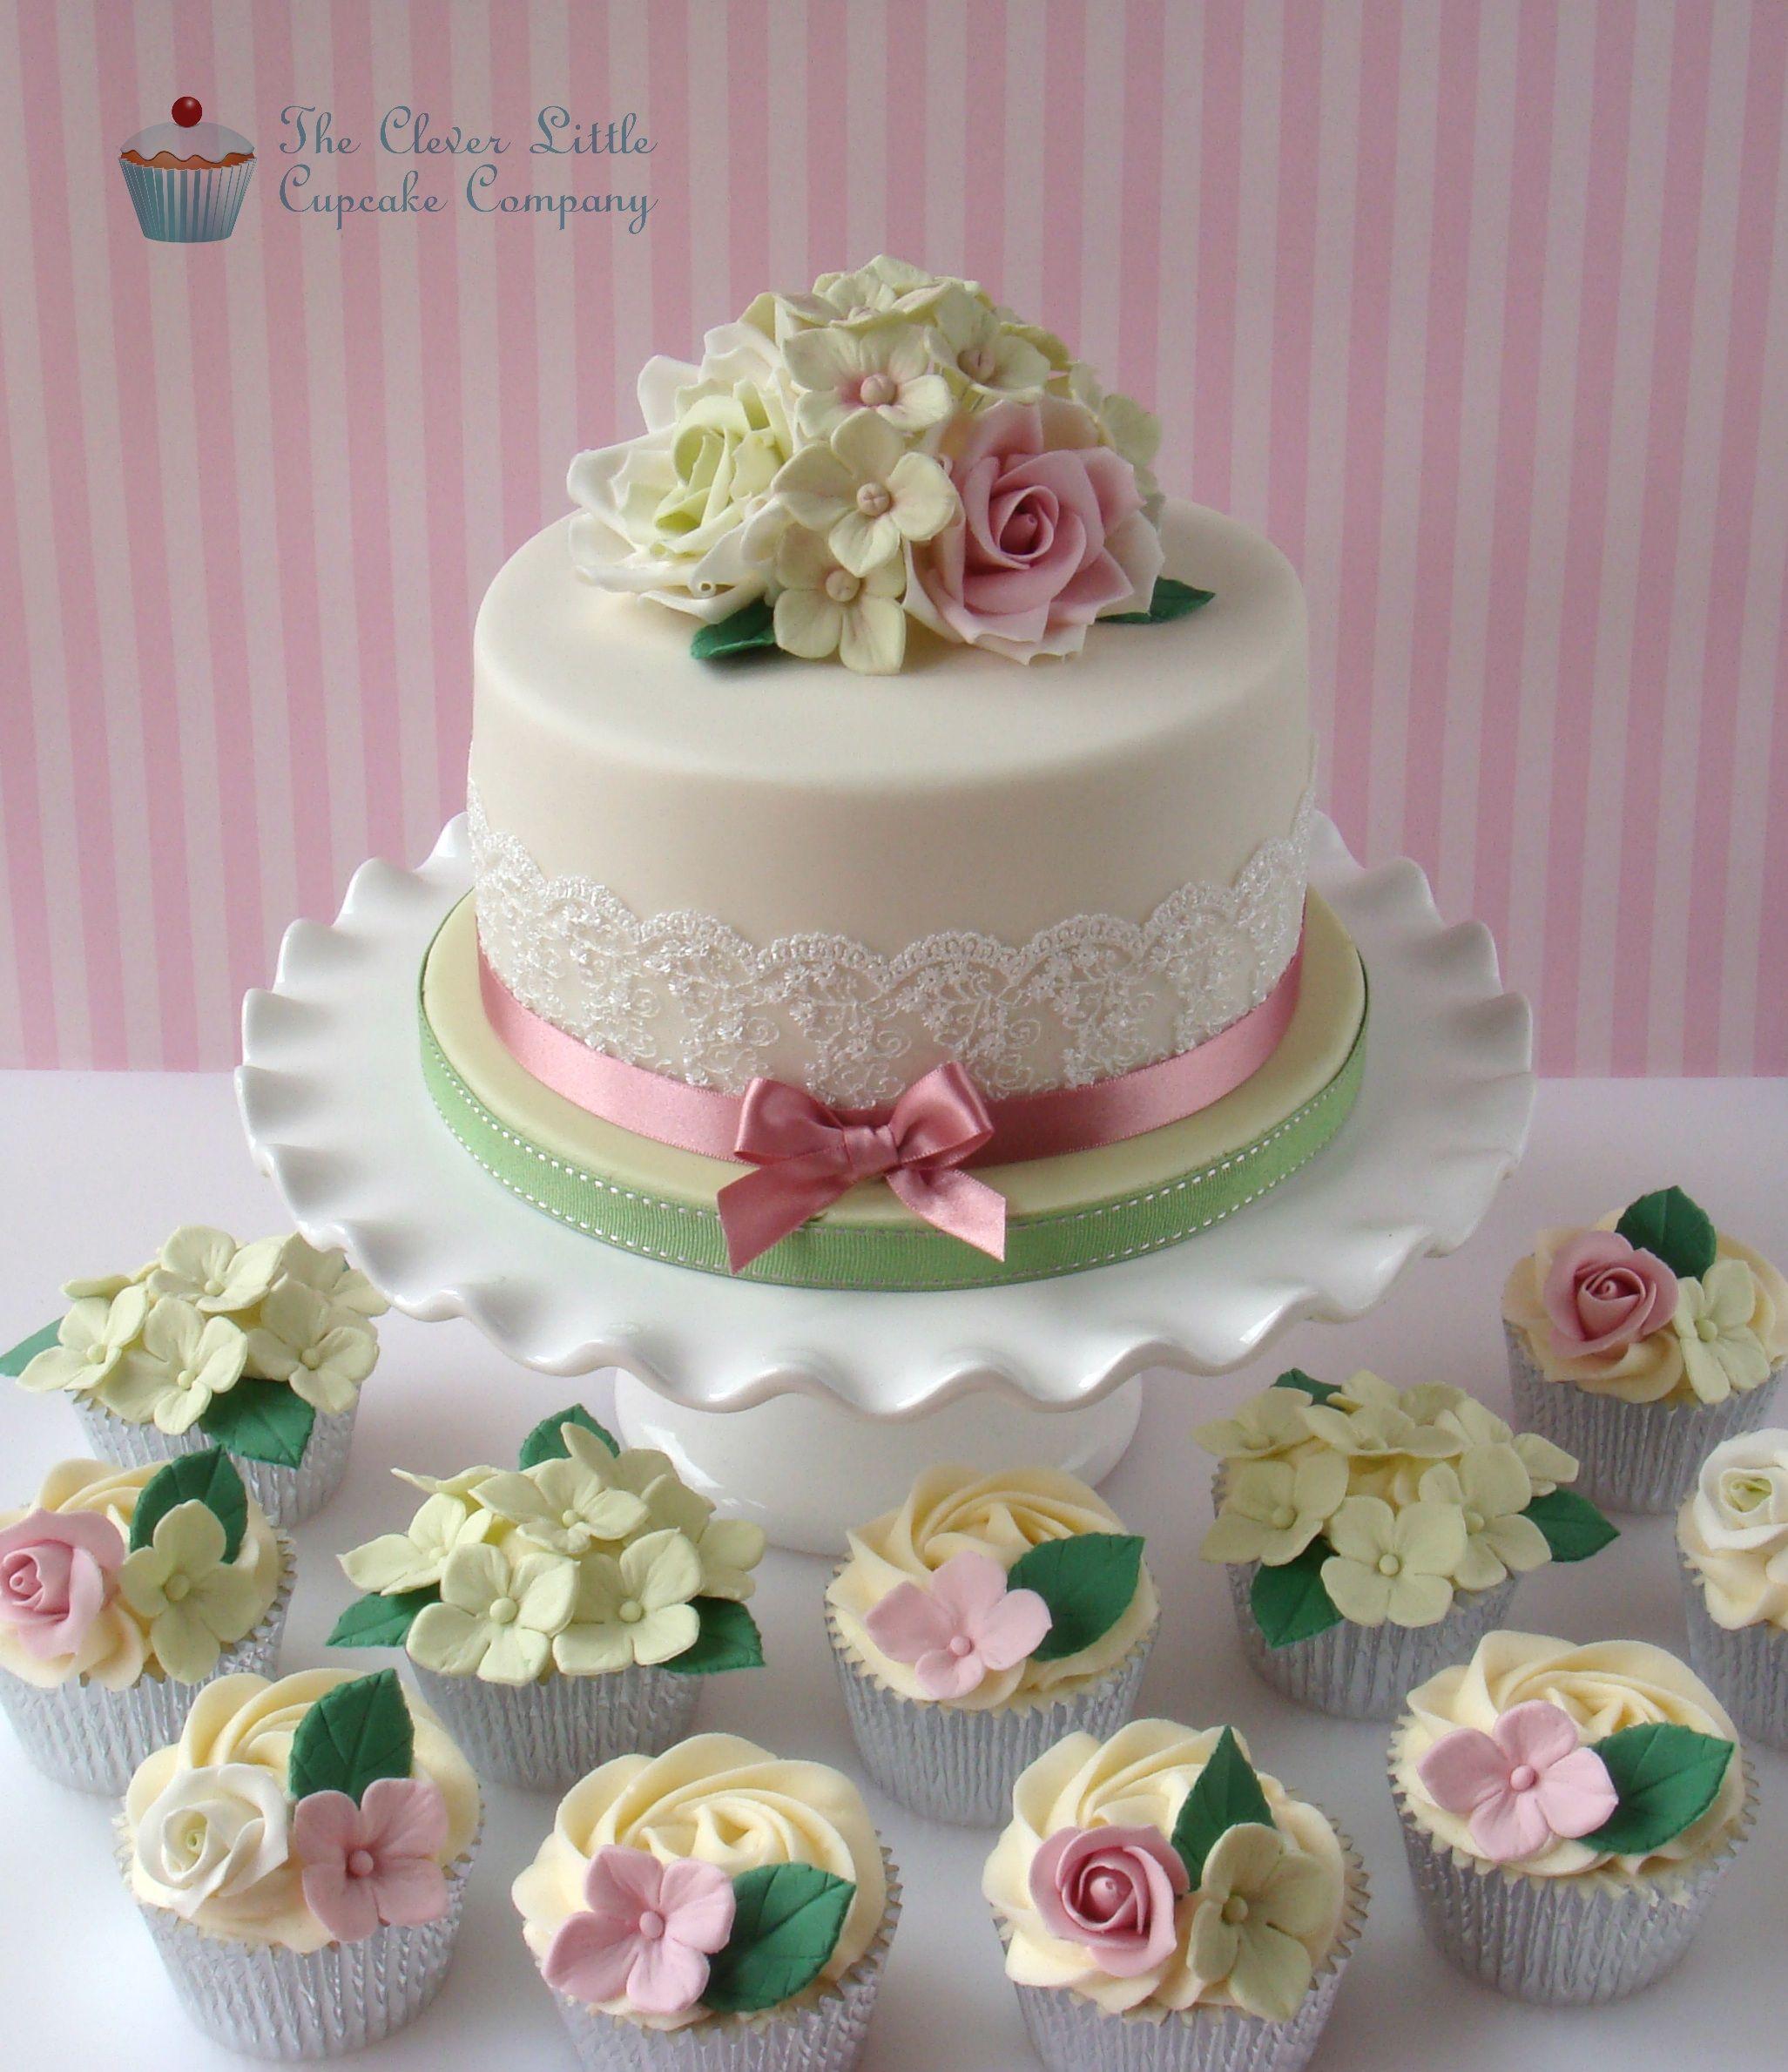 Roses Hydrangeas 90th Birthday Cake Rich fruit cake with